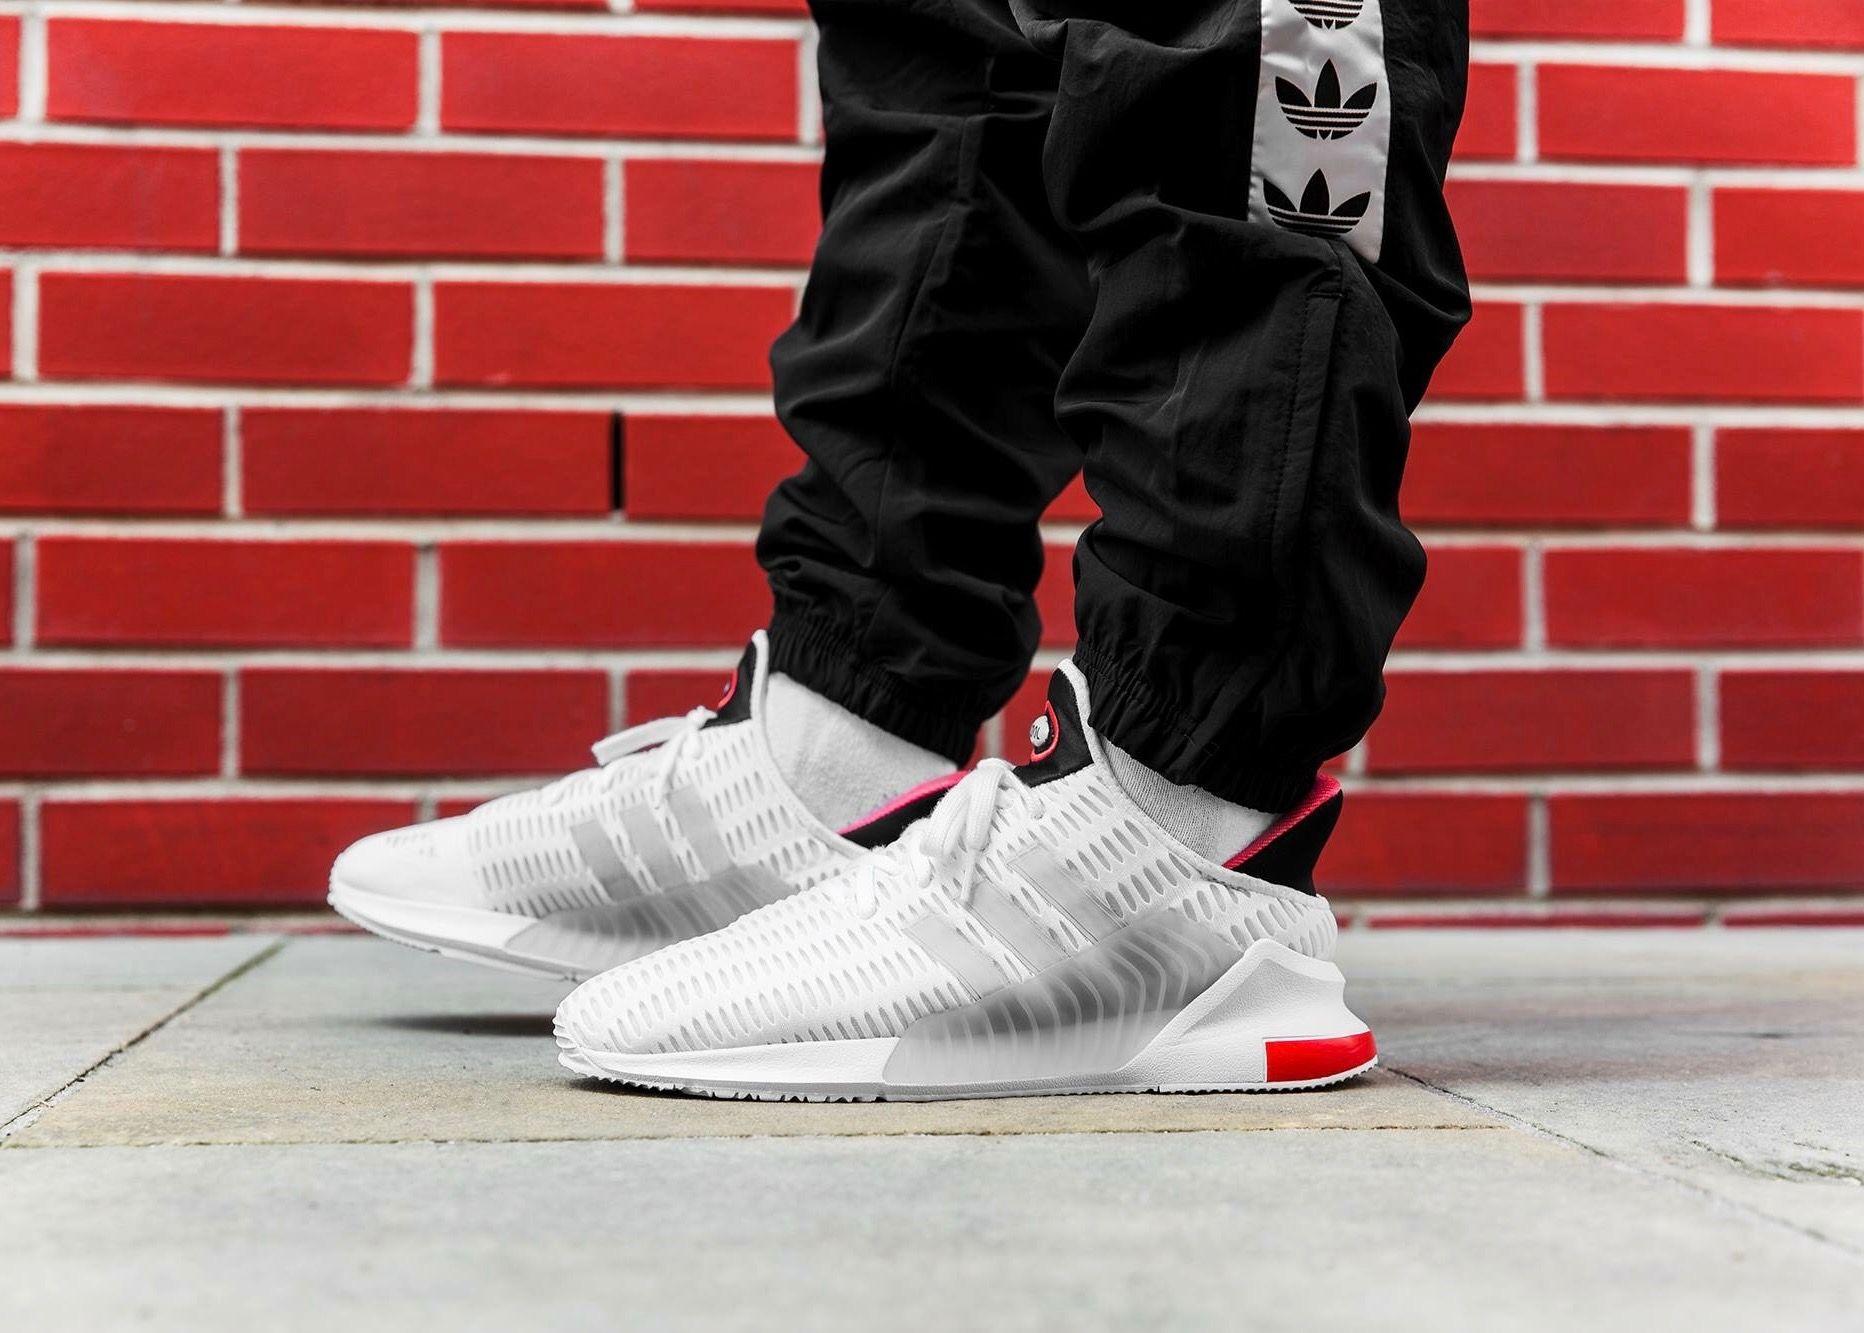 Adidas Launch Adizero Ubersonic Sun Tzu | Adidas schuhe